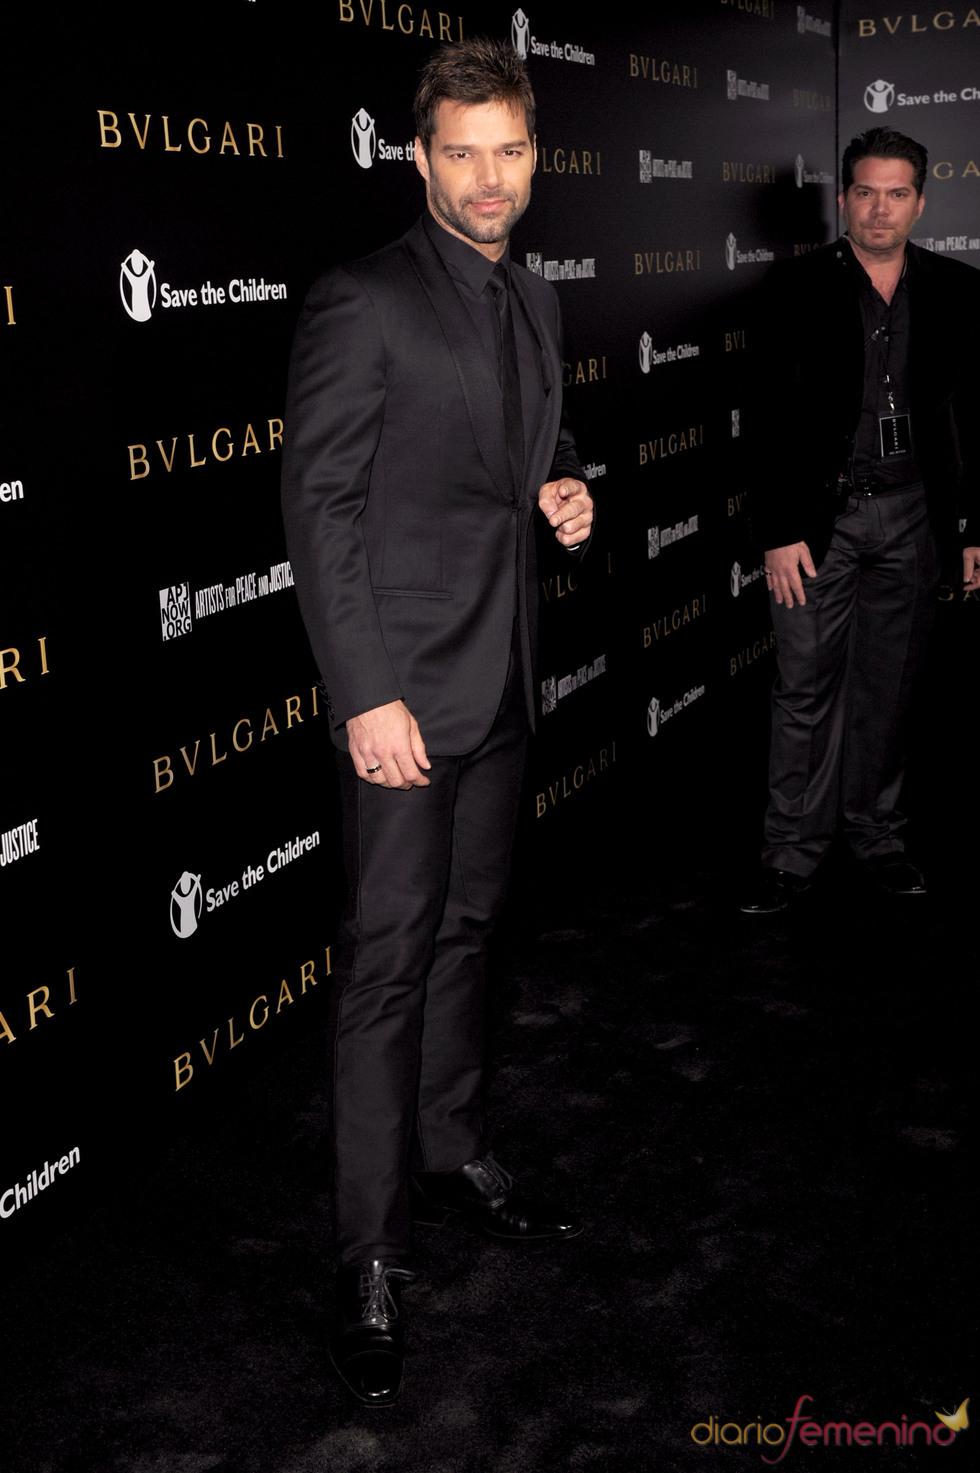 Ricky Martin en la gala benéfica de Bulgari